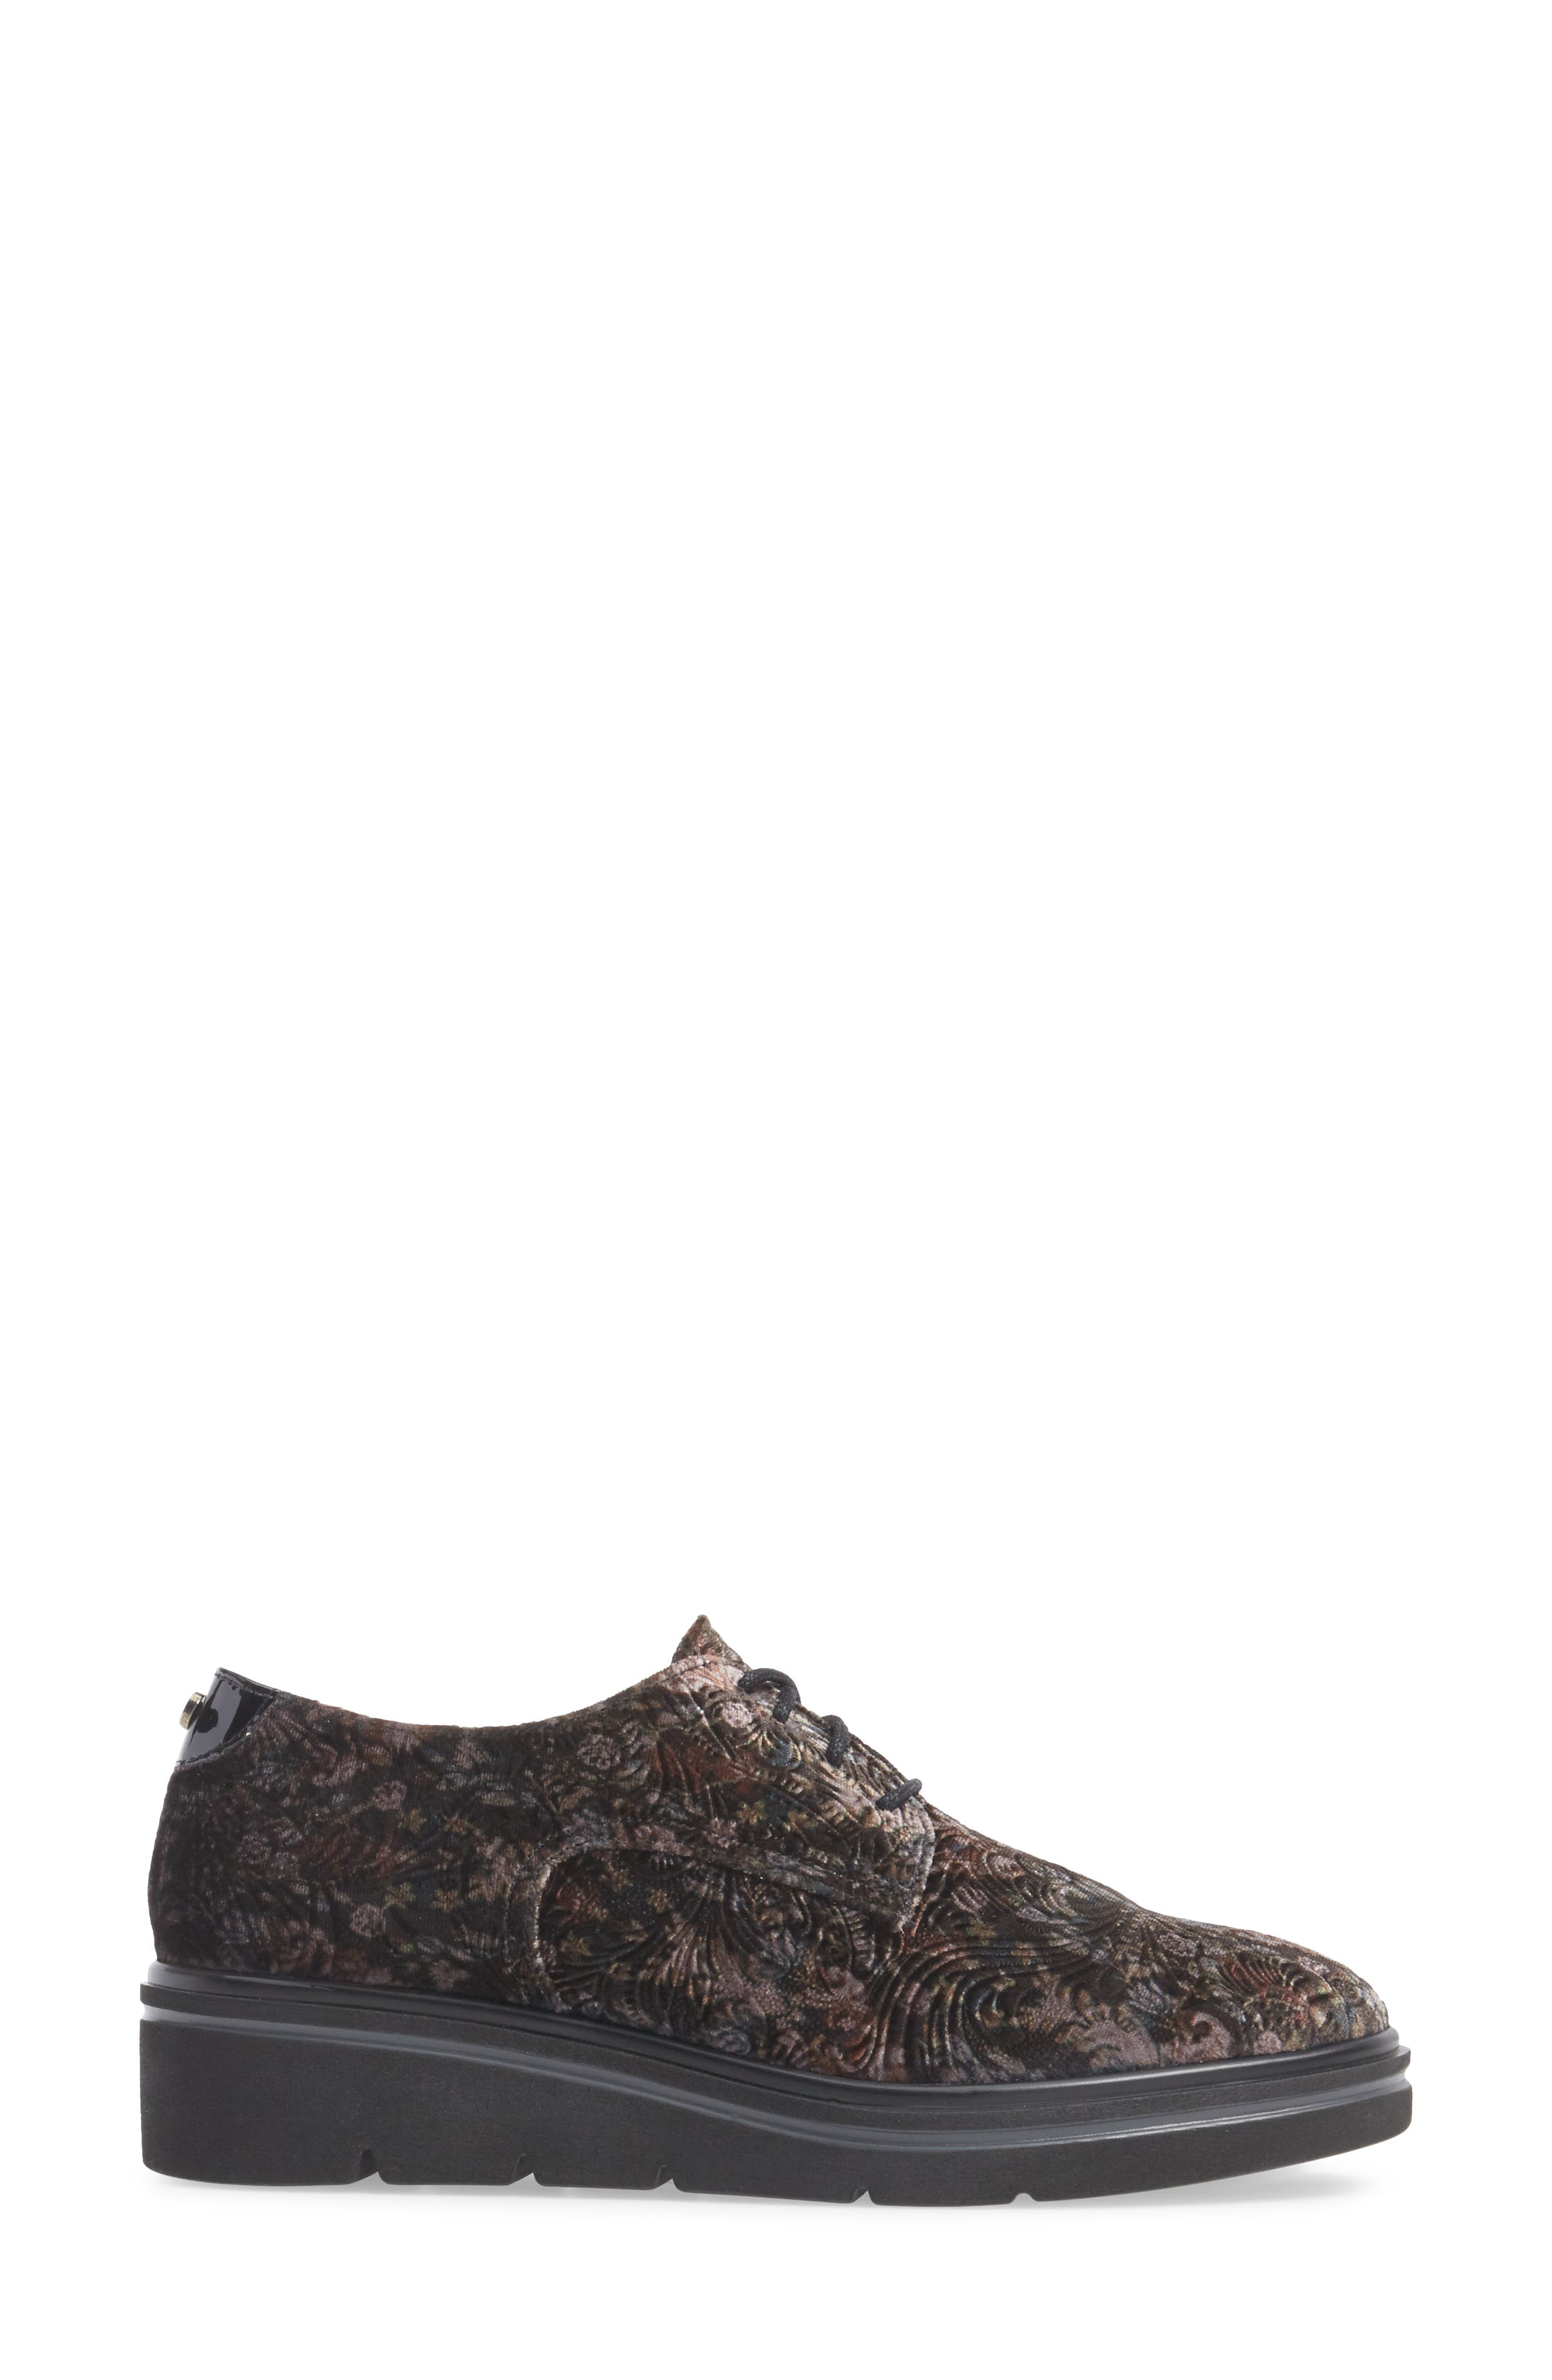 Richelle Oxford Sneaker,                             Alternate thumbnail 3, color,                             GREY FABRIC